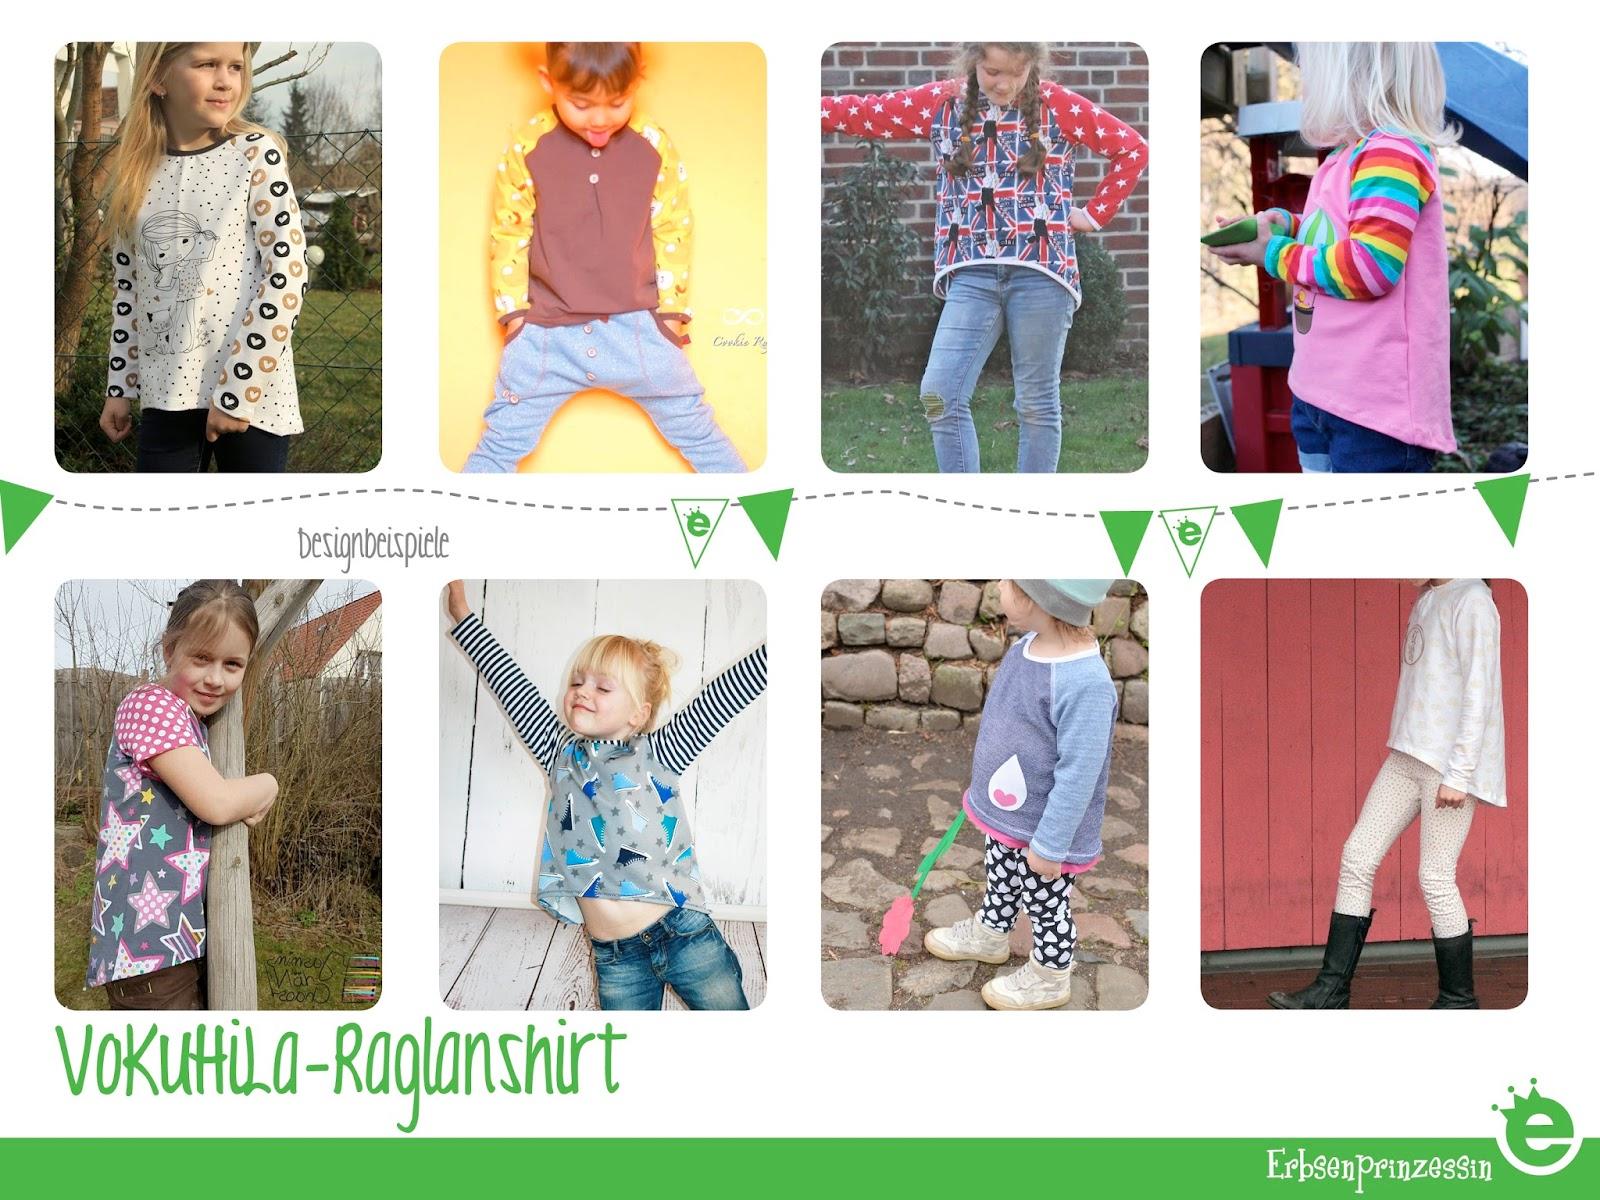 Schnittmuster: VoKuHiLa-Raglanshirt für Kinder - Erbsenprinzessin Blog